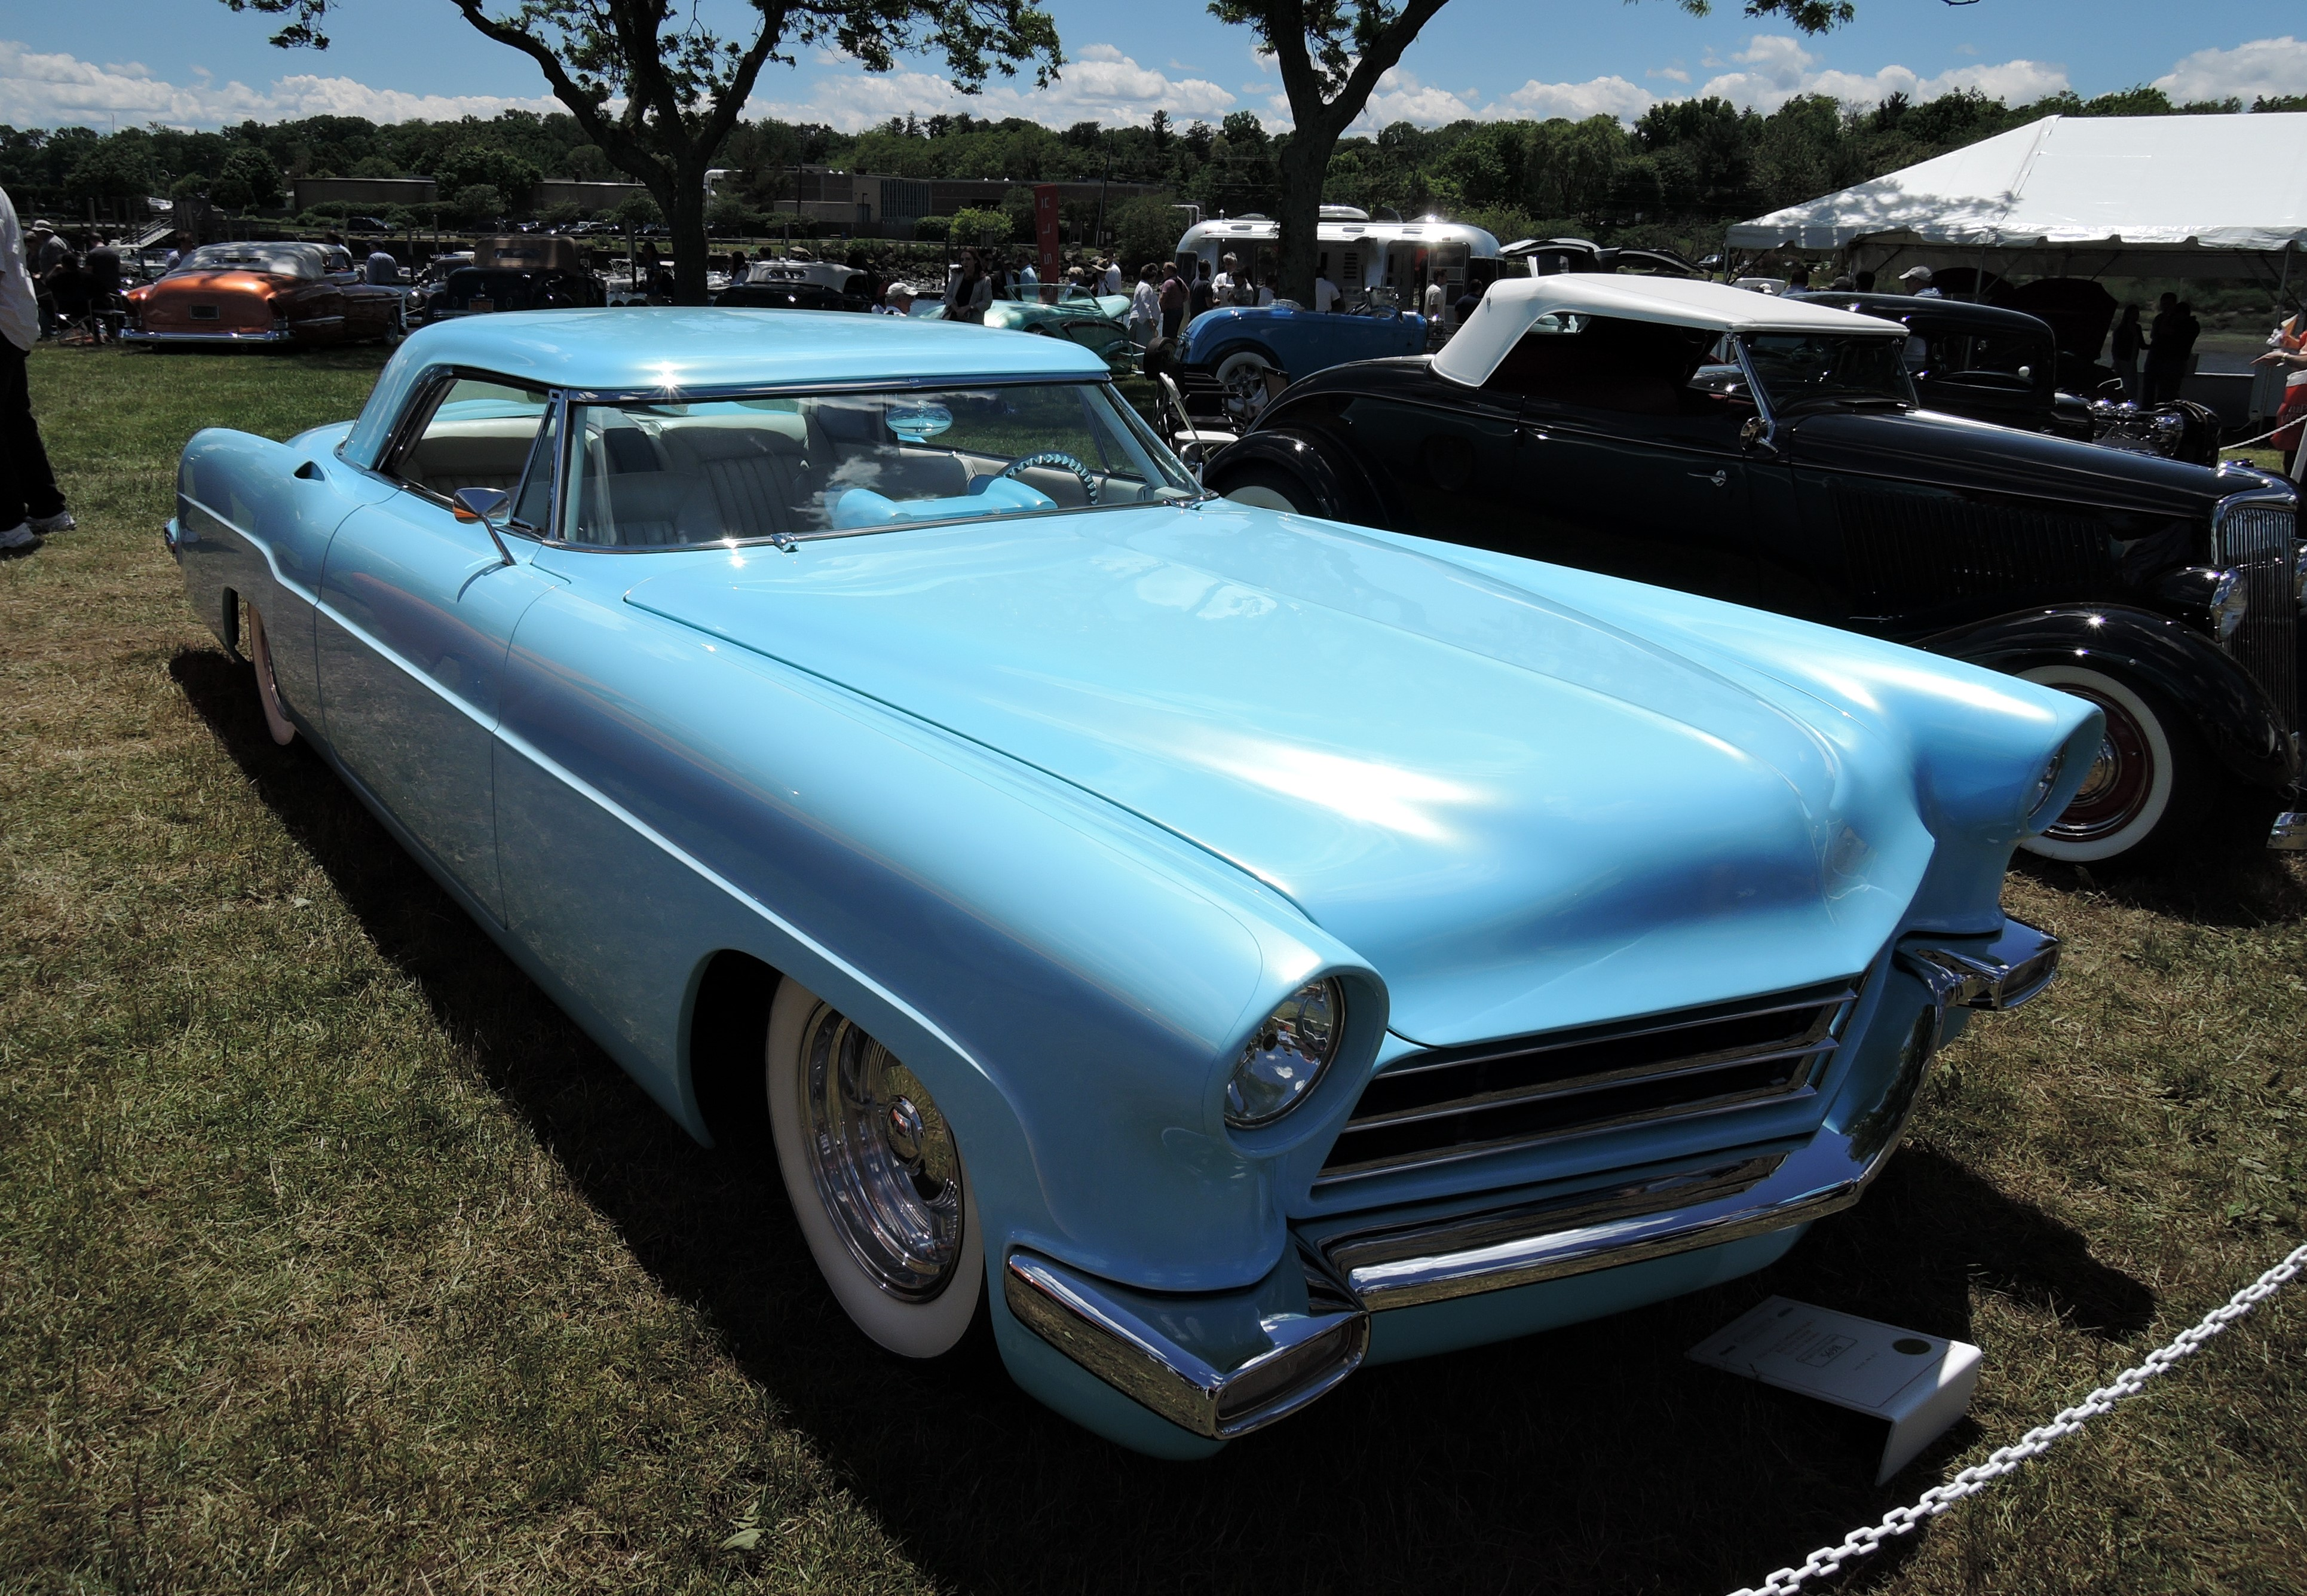 blue 1956 Lincoln Continental Mark II Rick Dore Kustom - Greenwich Concours d'Elegance 2017